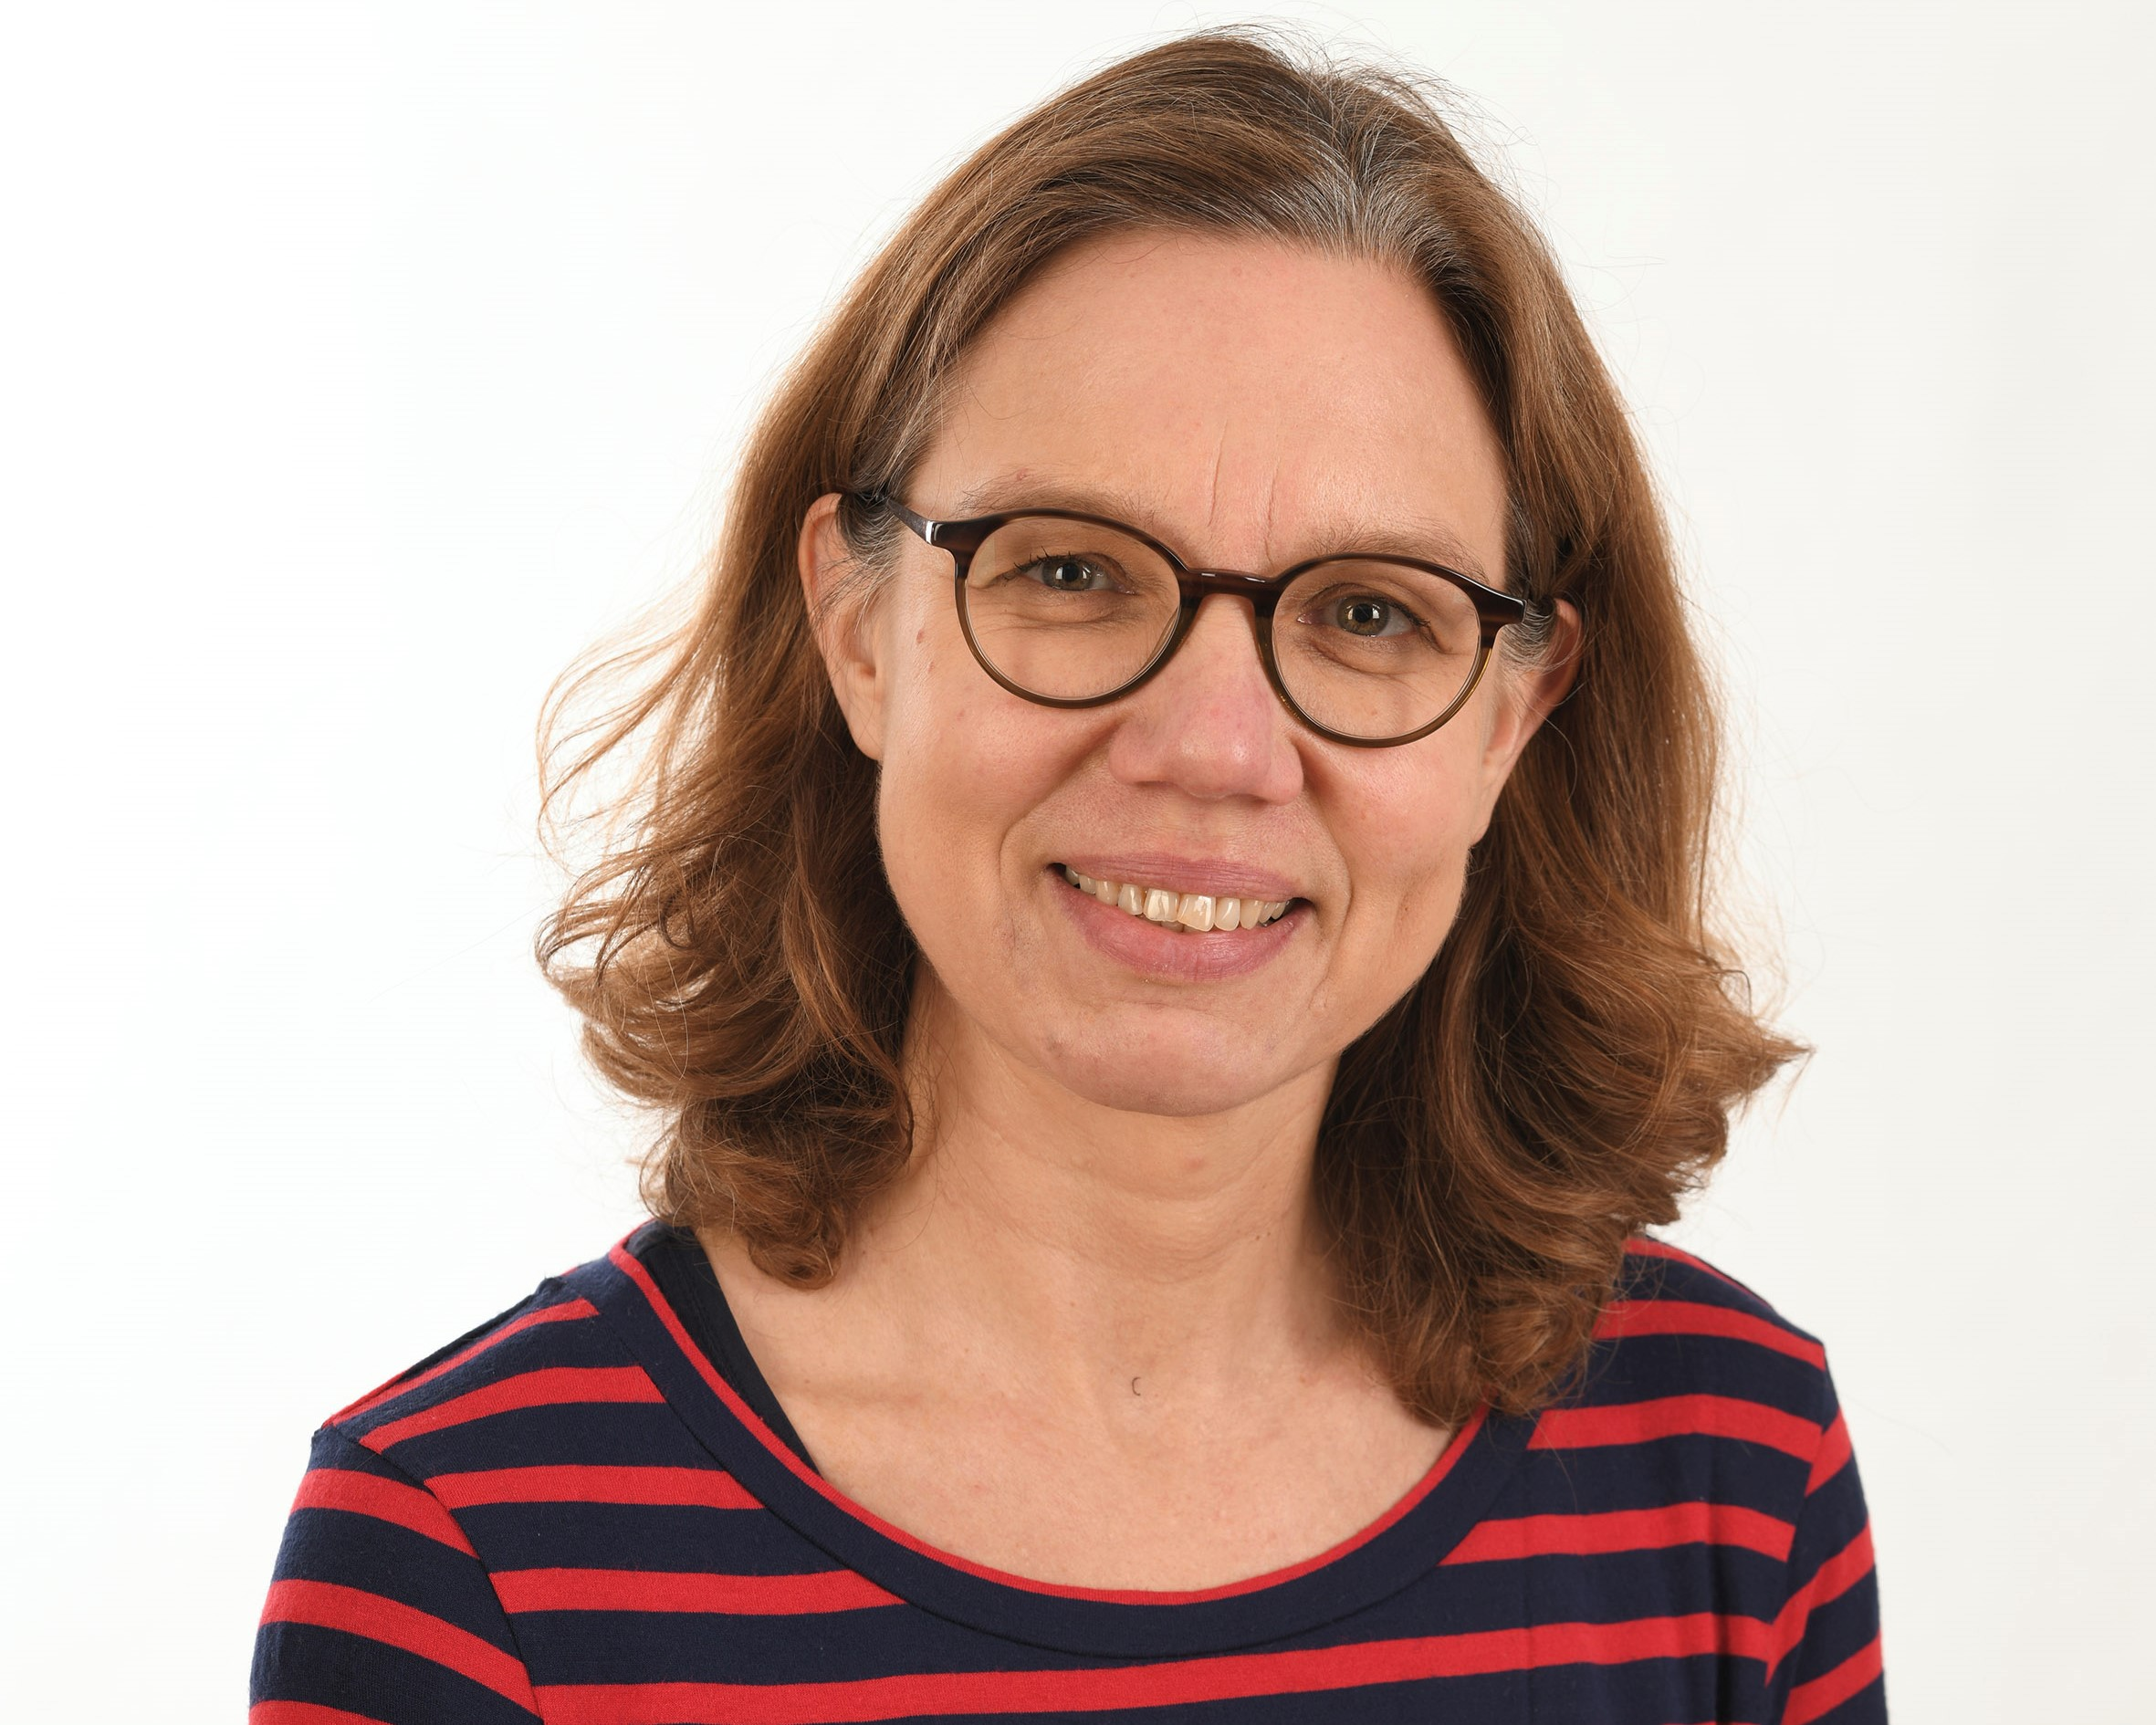 Meike Becker-Bubat